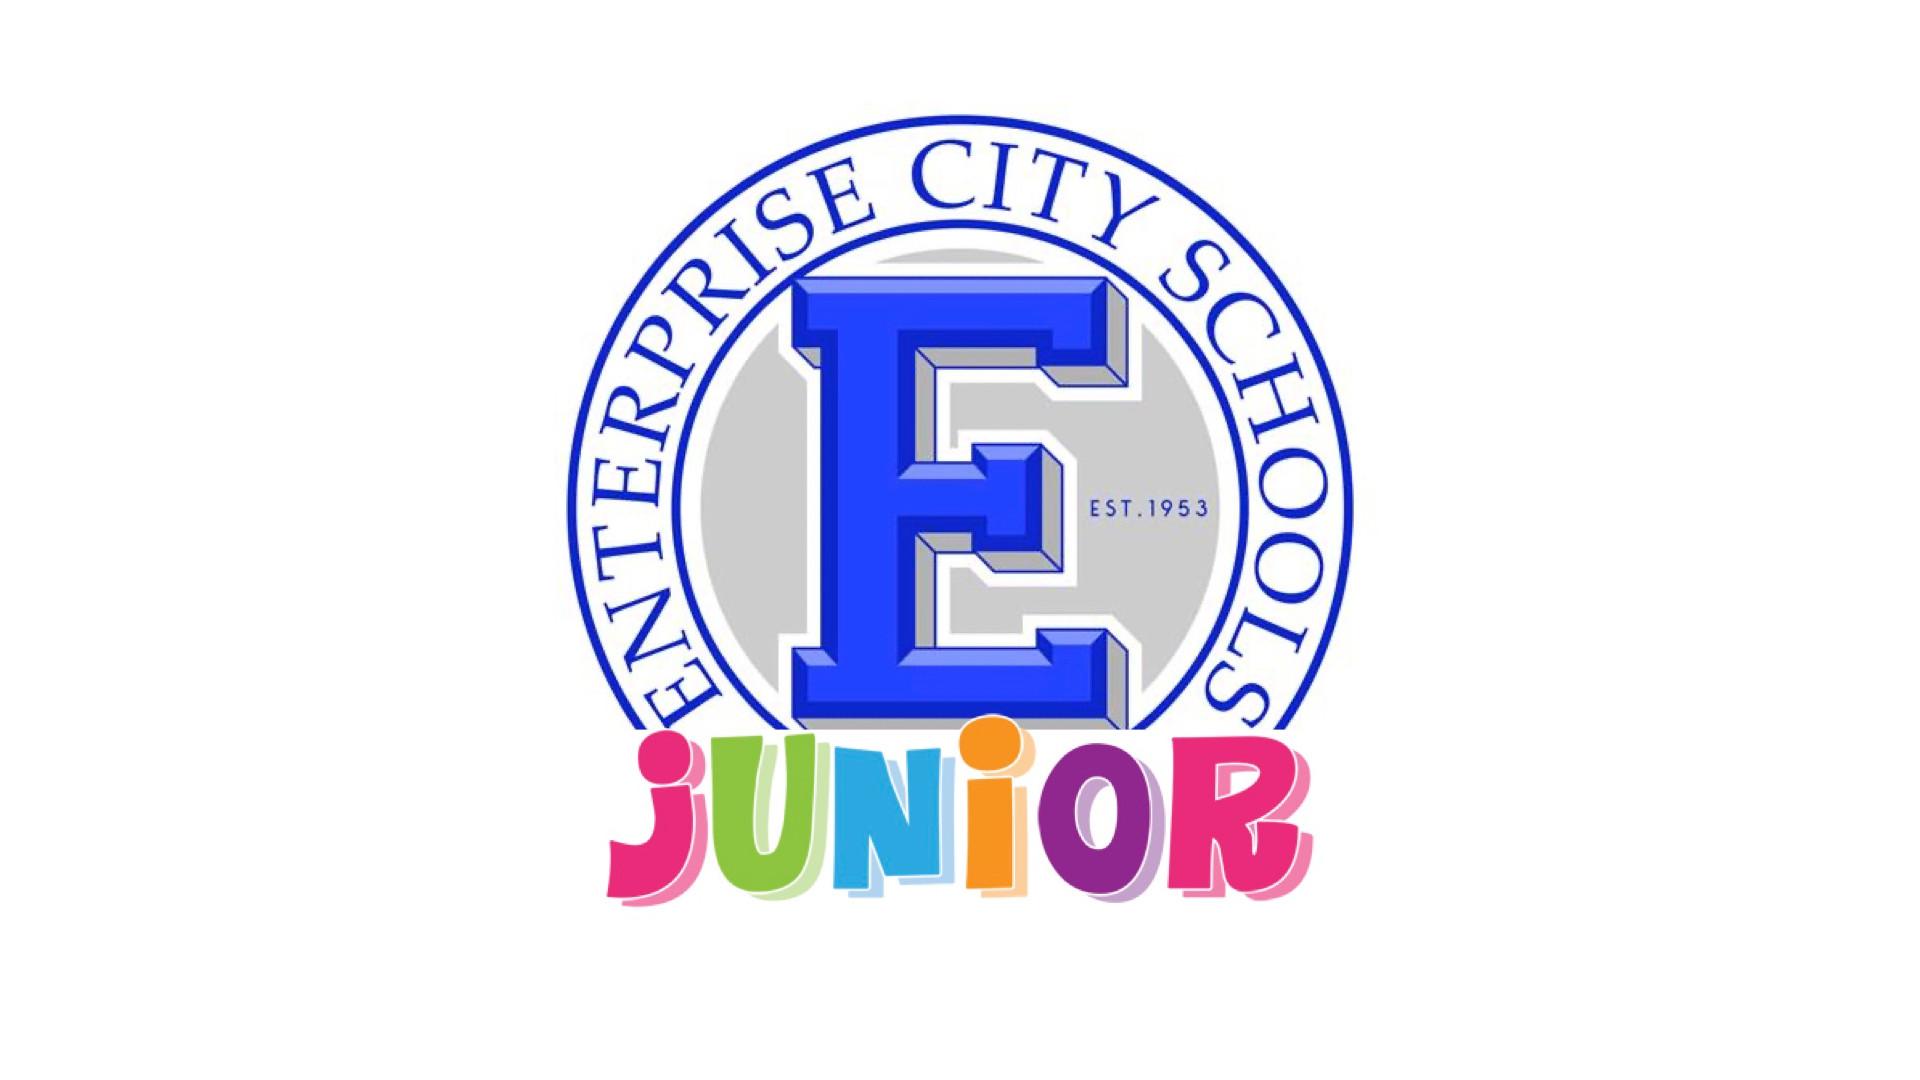 Enterprise City Jr.